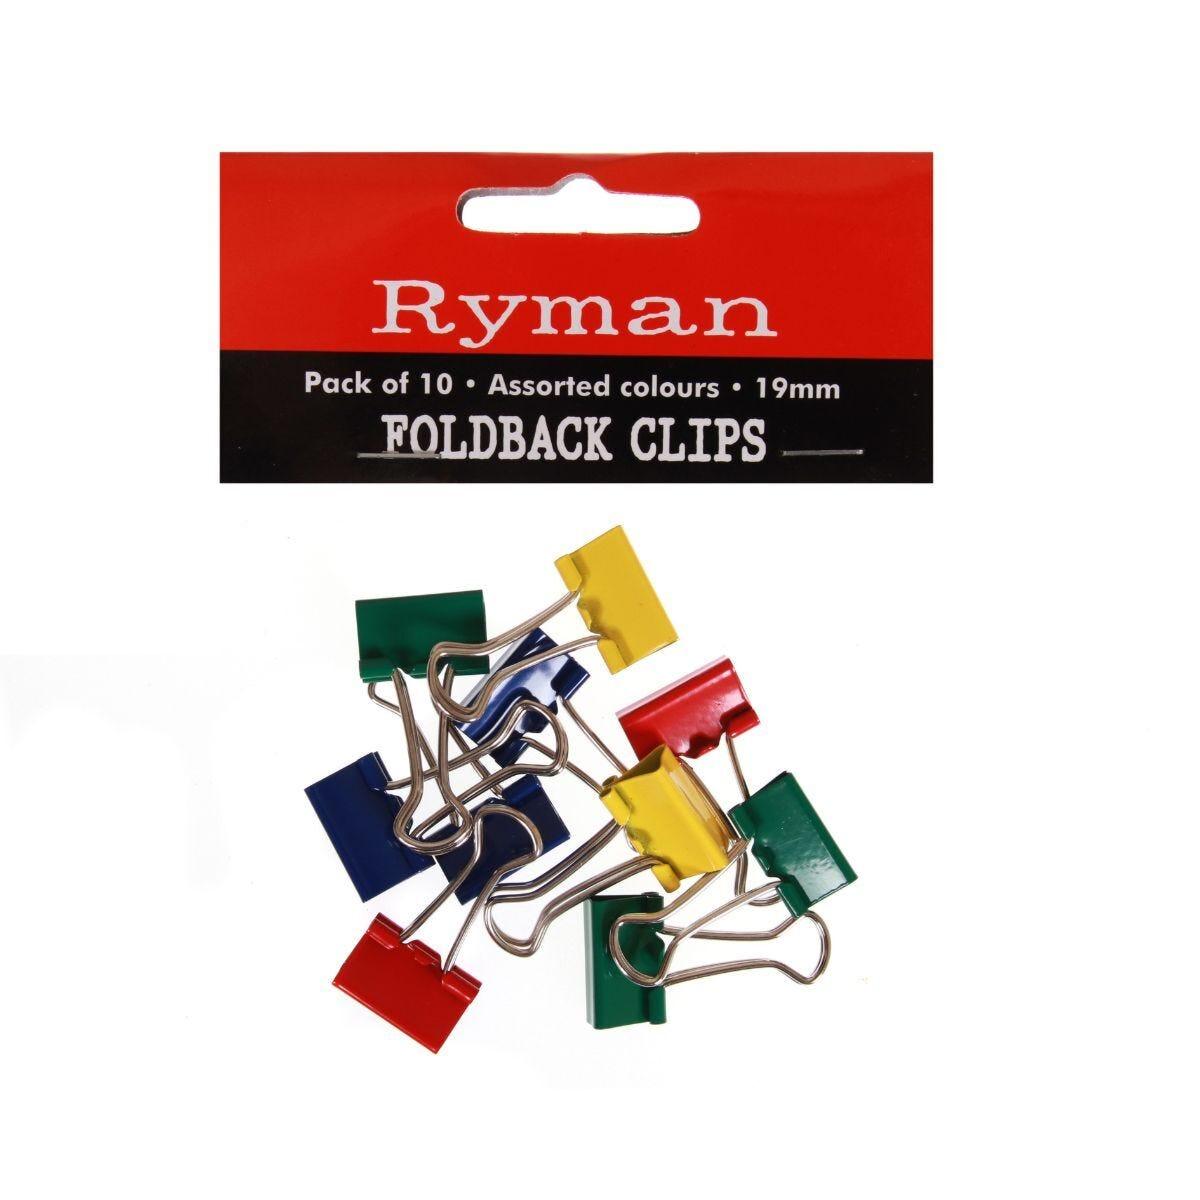 Ryman Foldback Clips 19mm Pack of 10